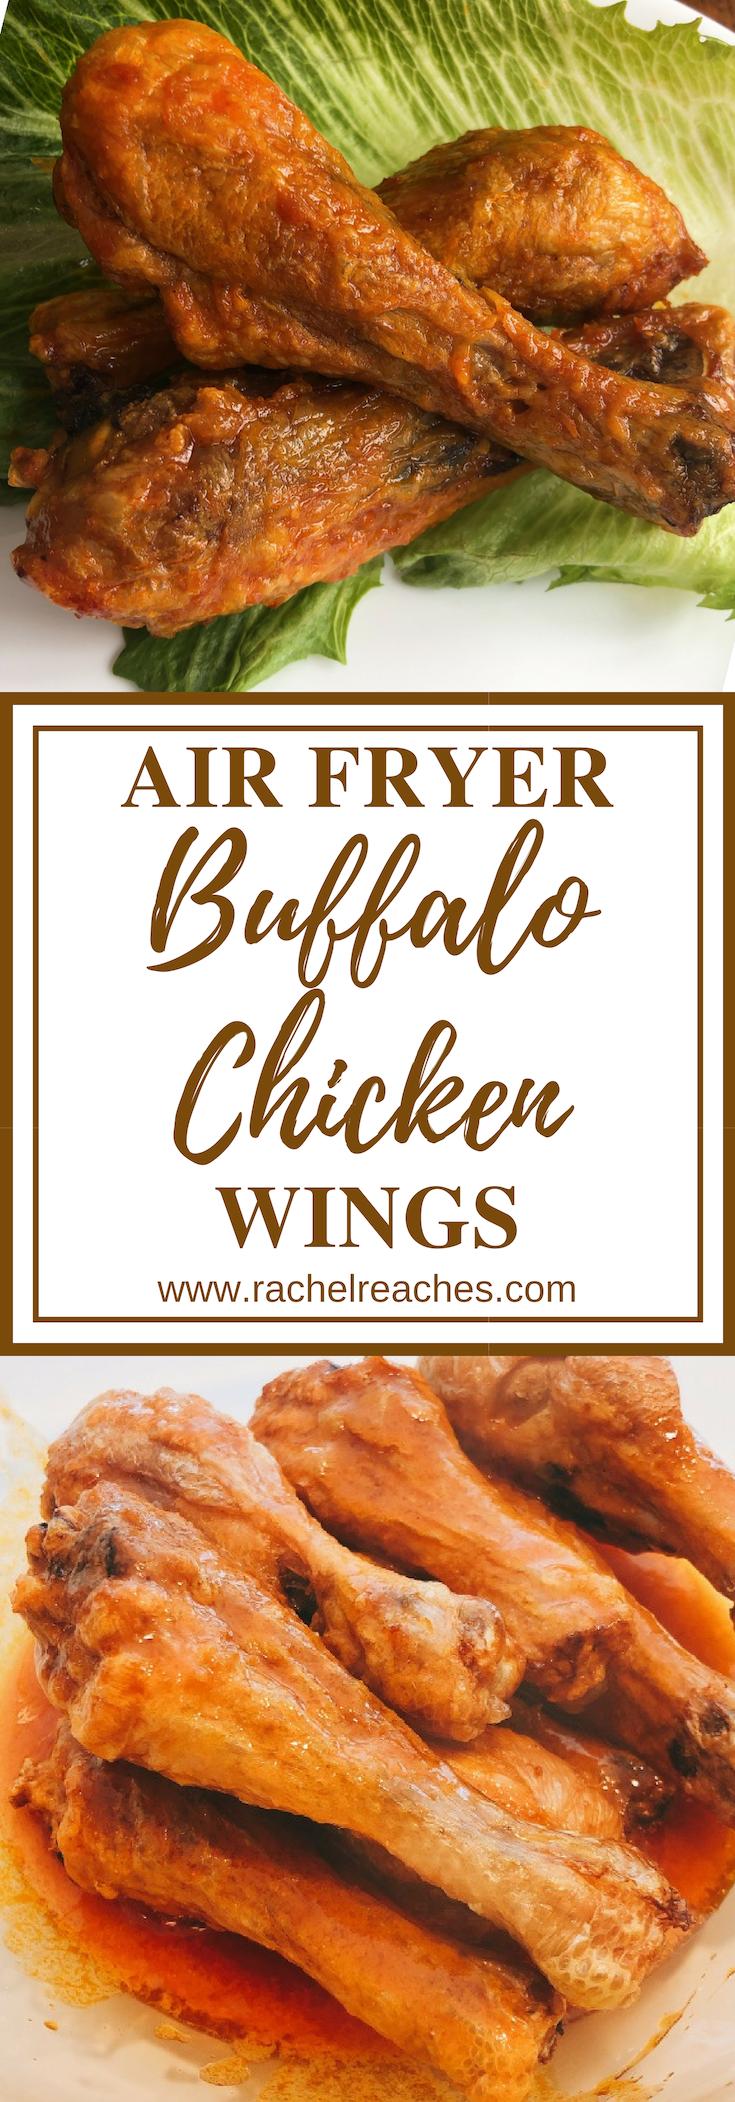 Air Fryer Chicken Wings Pin - Healthy Eating.png